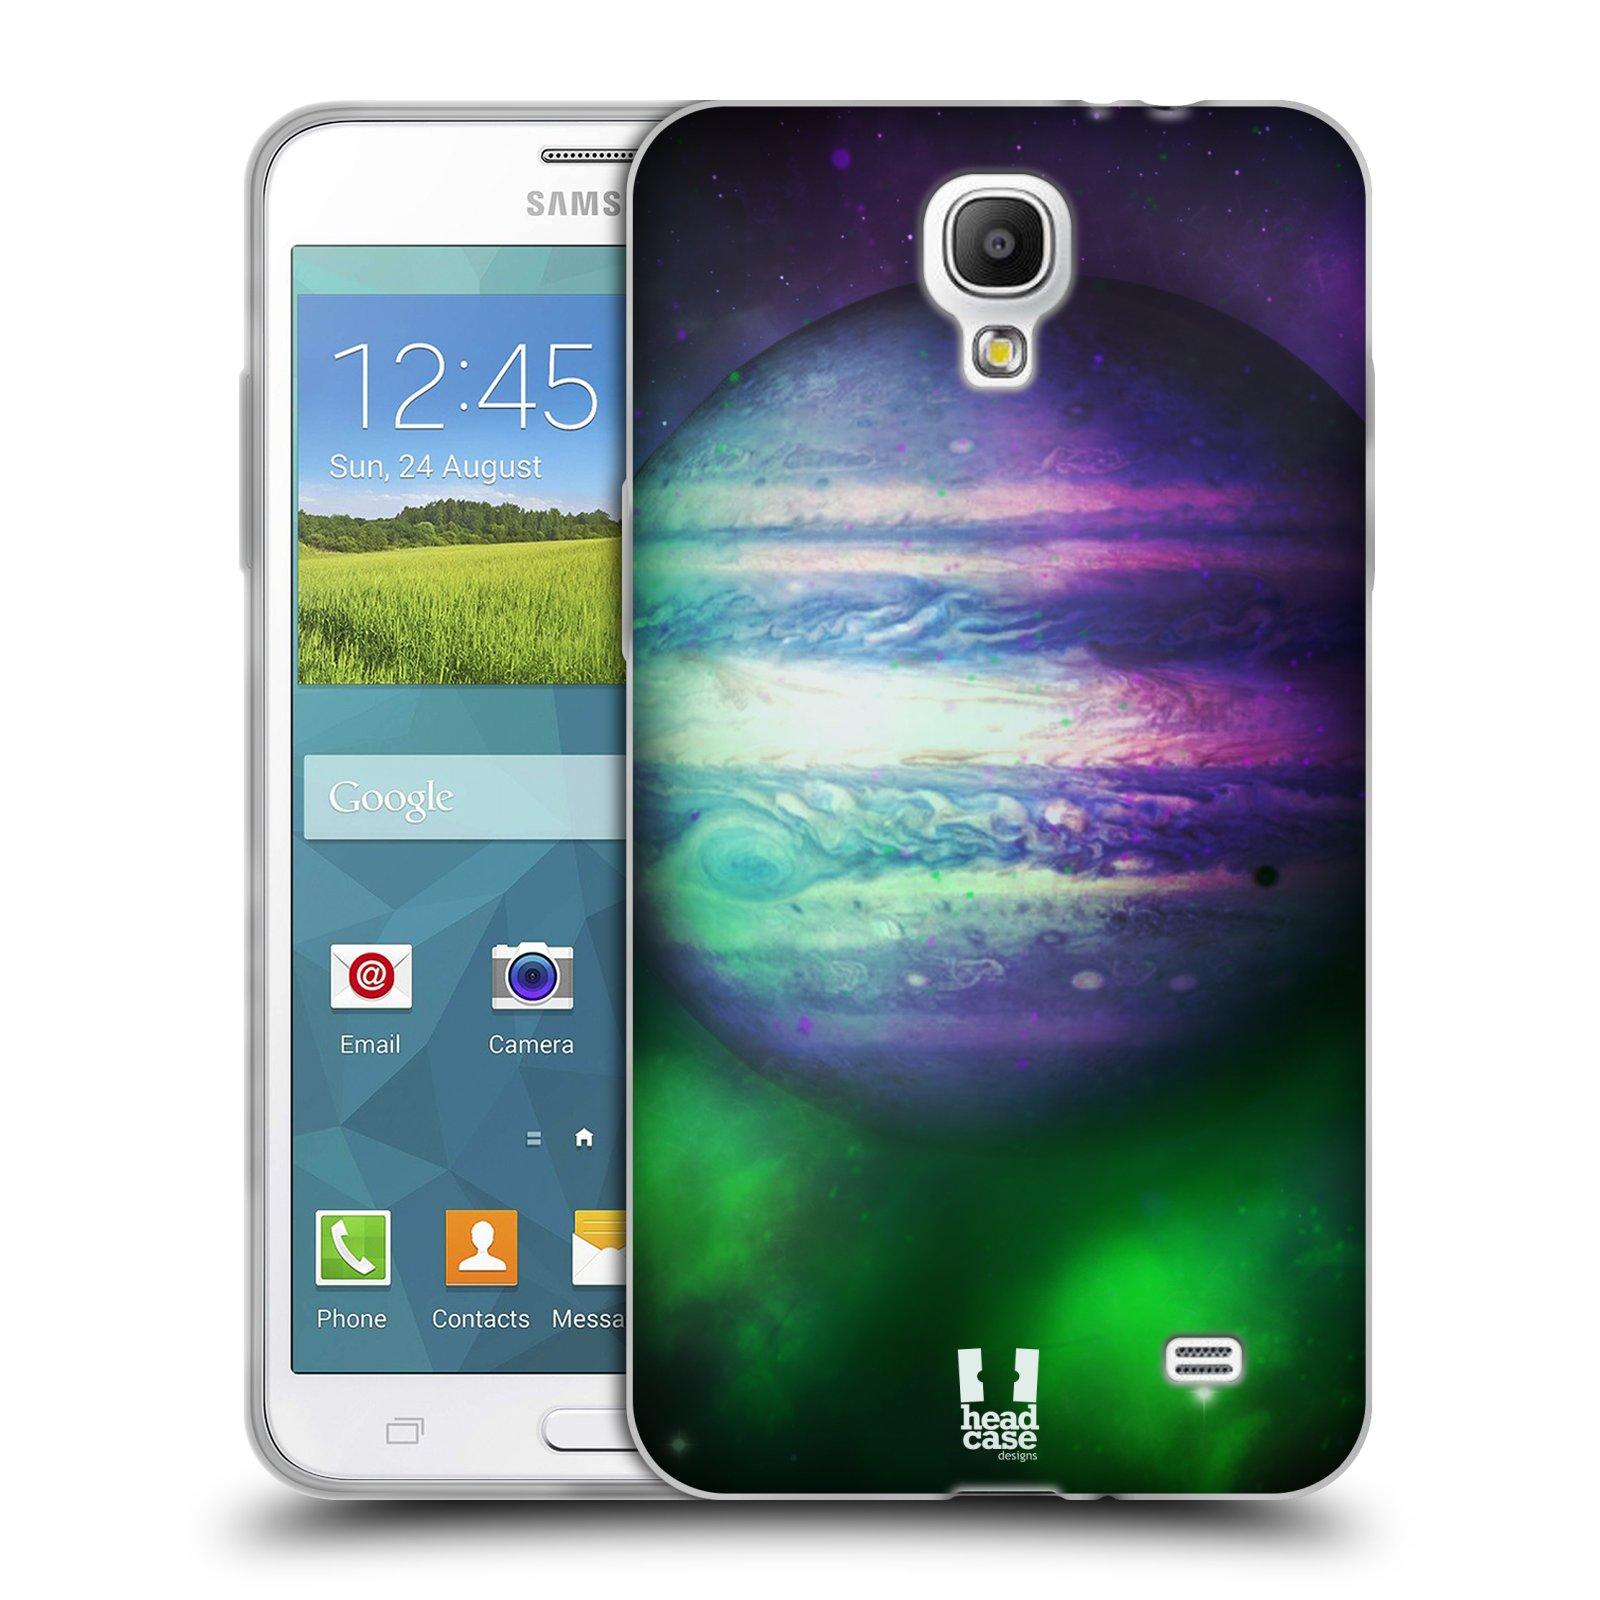 HEAD CASE silikonový obal na mobil Samsung Galaxy Mega 2 vzor Vesmírná krása JUPITER MODRÁ